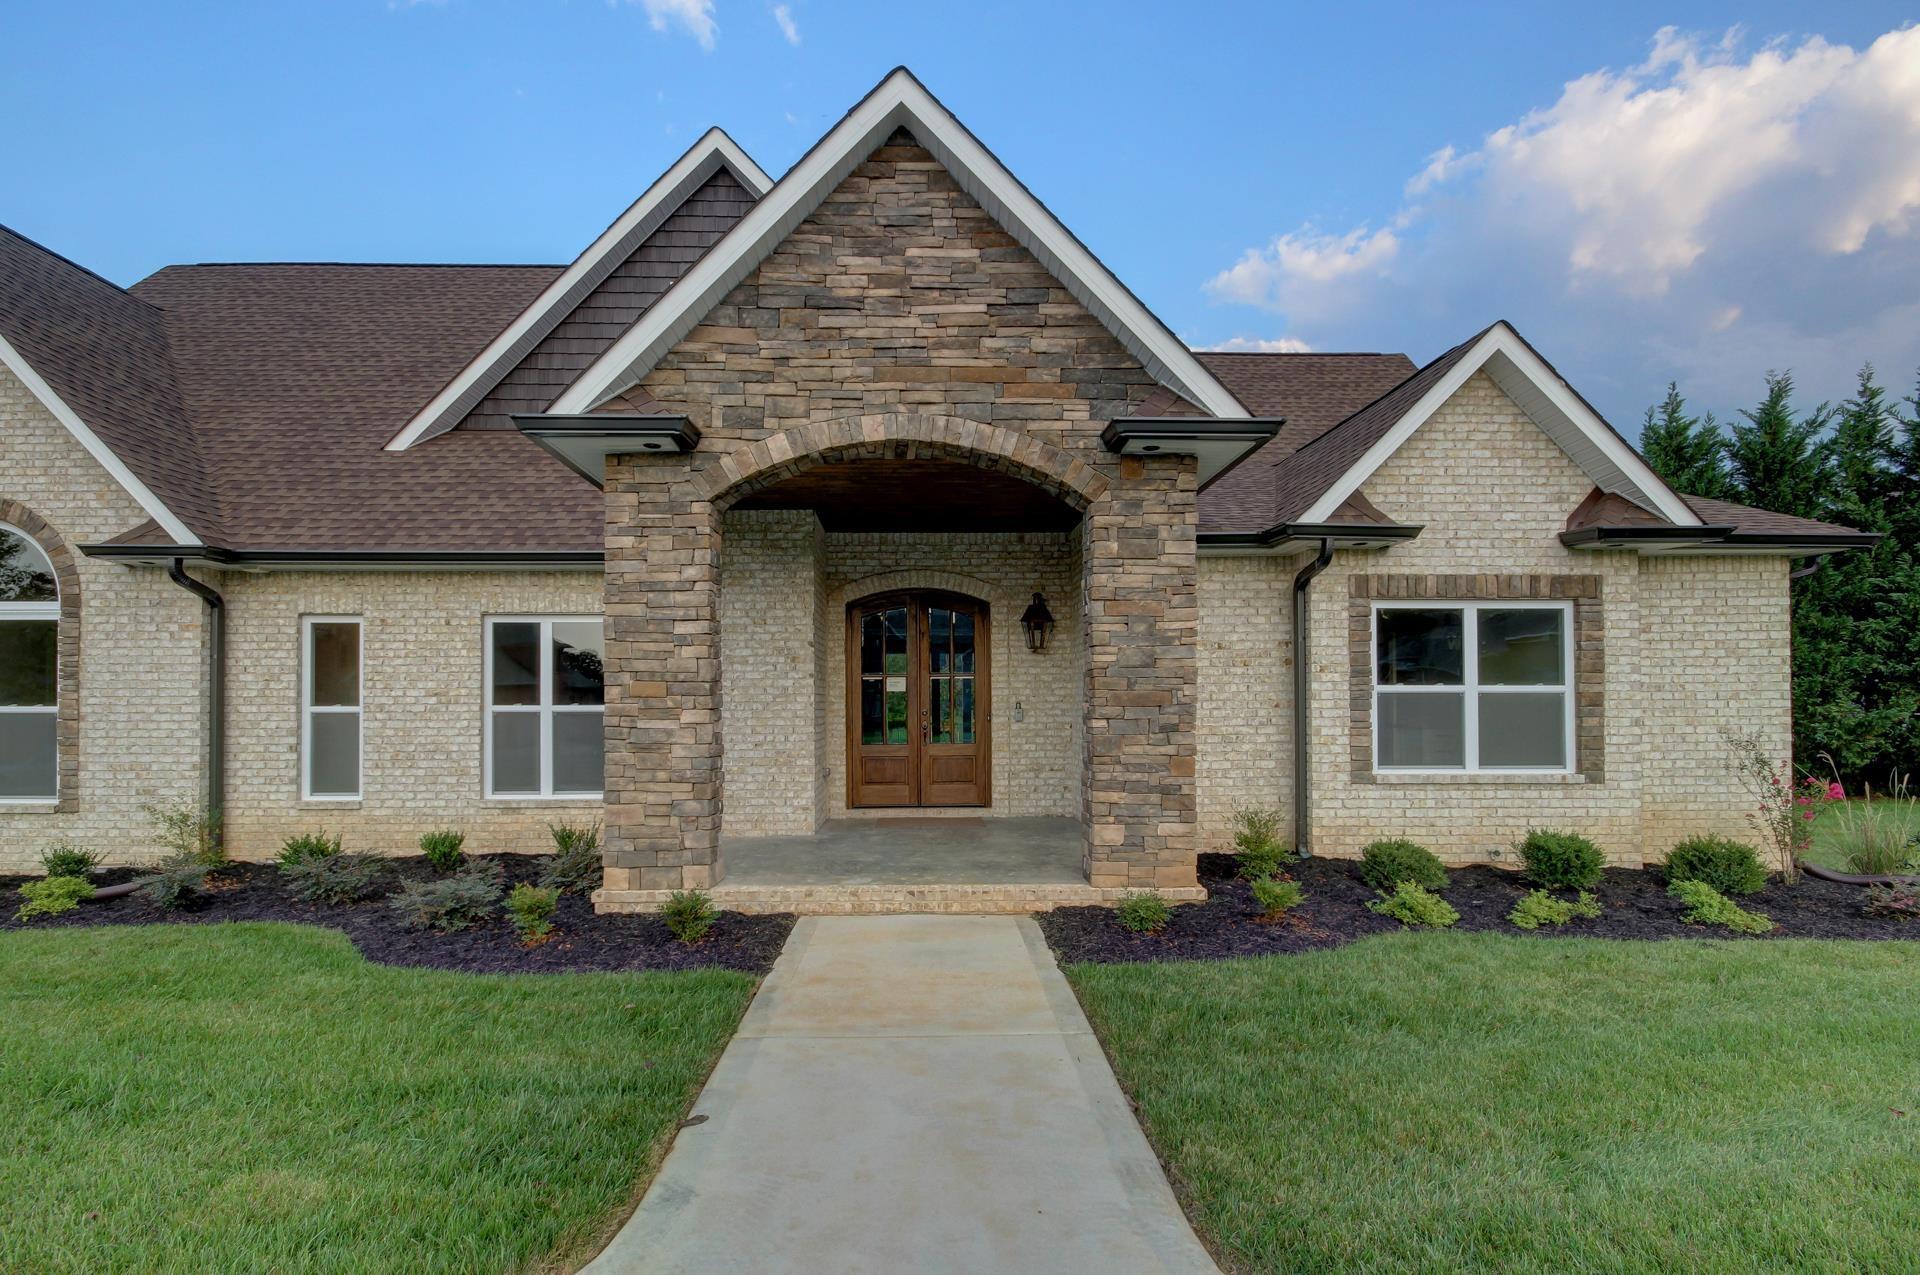 Clarksville new construction homes nashville home guru for Clarksville tn home builders